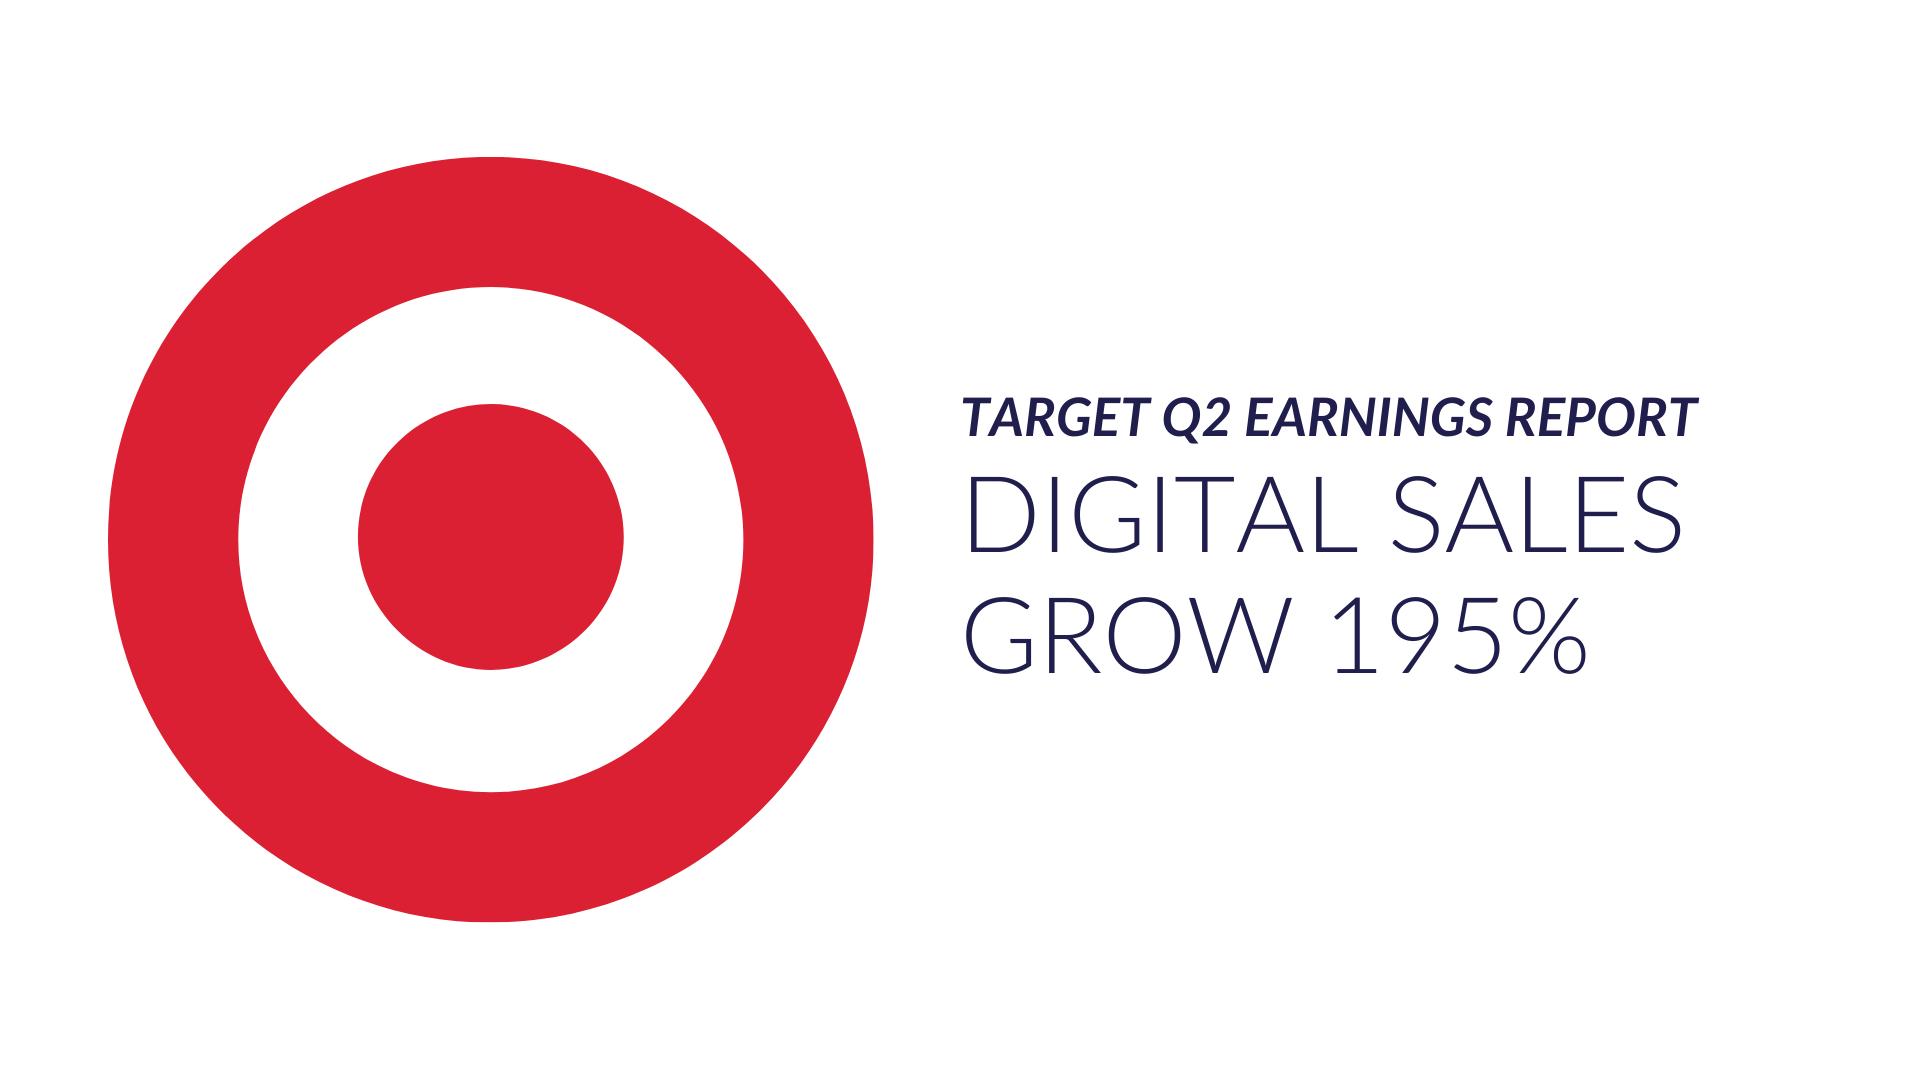 Target Earnings Q2 2020